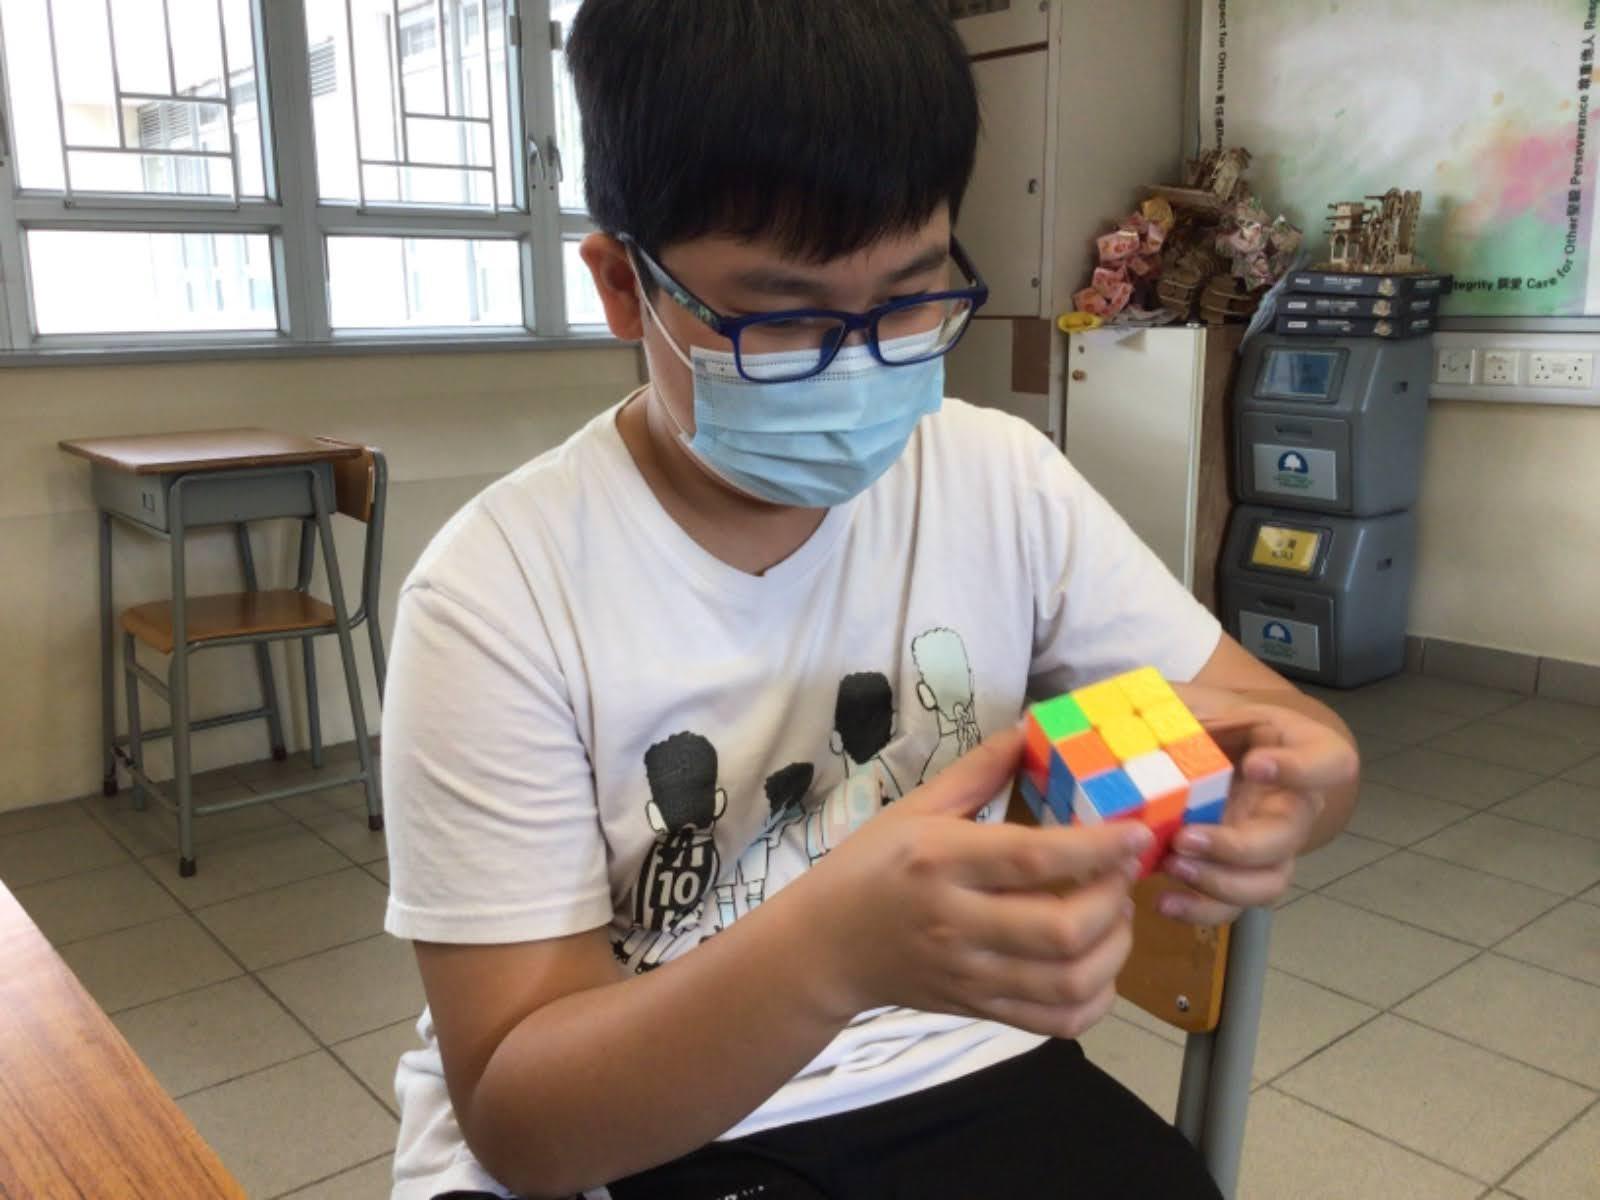 https://shingtak.edu.hk/sites/default/files/whatsapp_image_2020-12-11_at_14.37.47.jpg